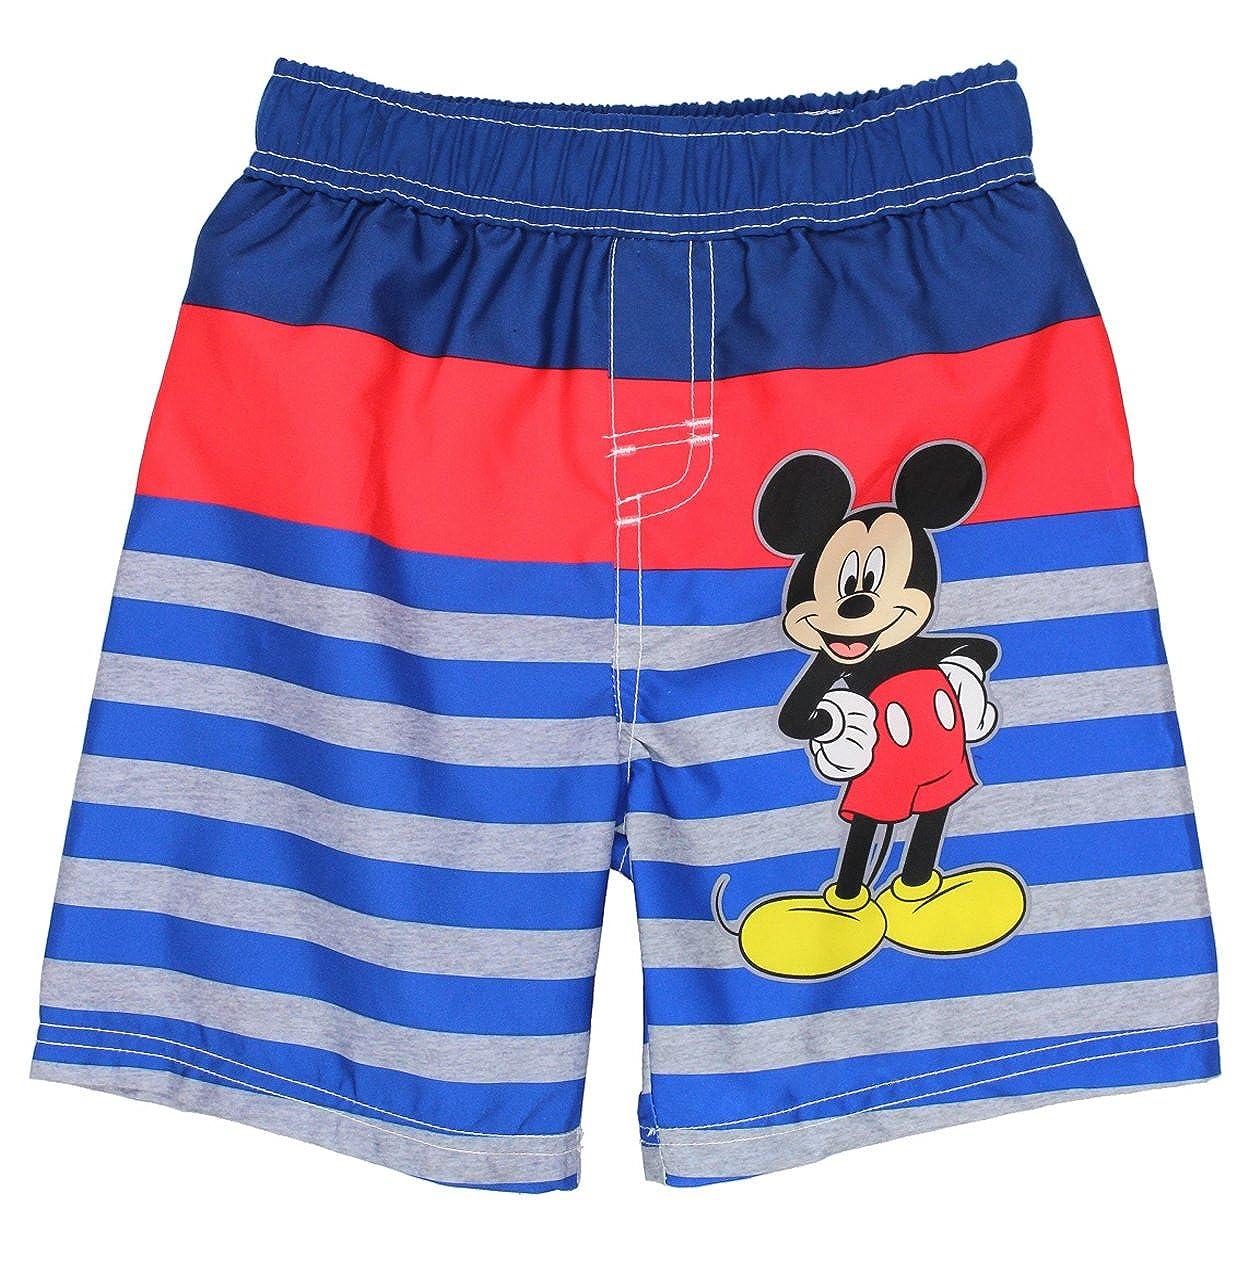 fa47067df5 Amazon.com: Mickey Mouse Boys Swim Trunks Swimwear (Baby/Toddler): Clothing